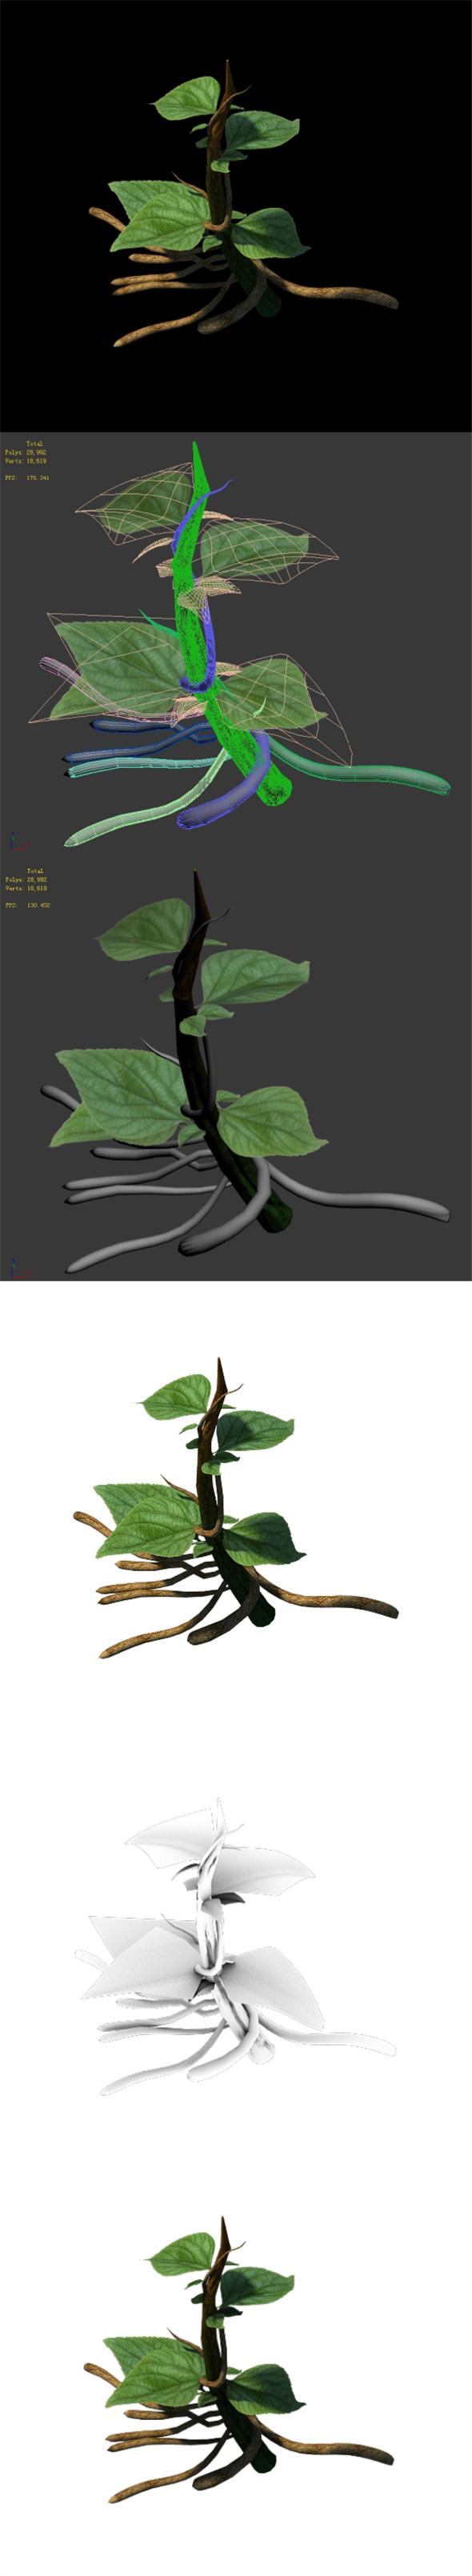 Plant Trees - Vines 01 - 3DOcean Item for Sale